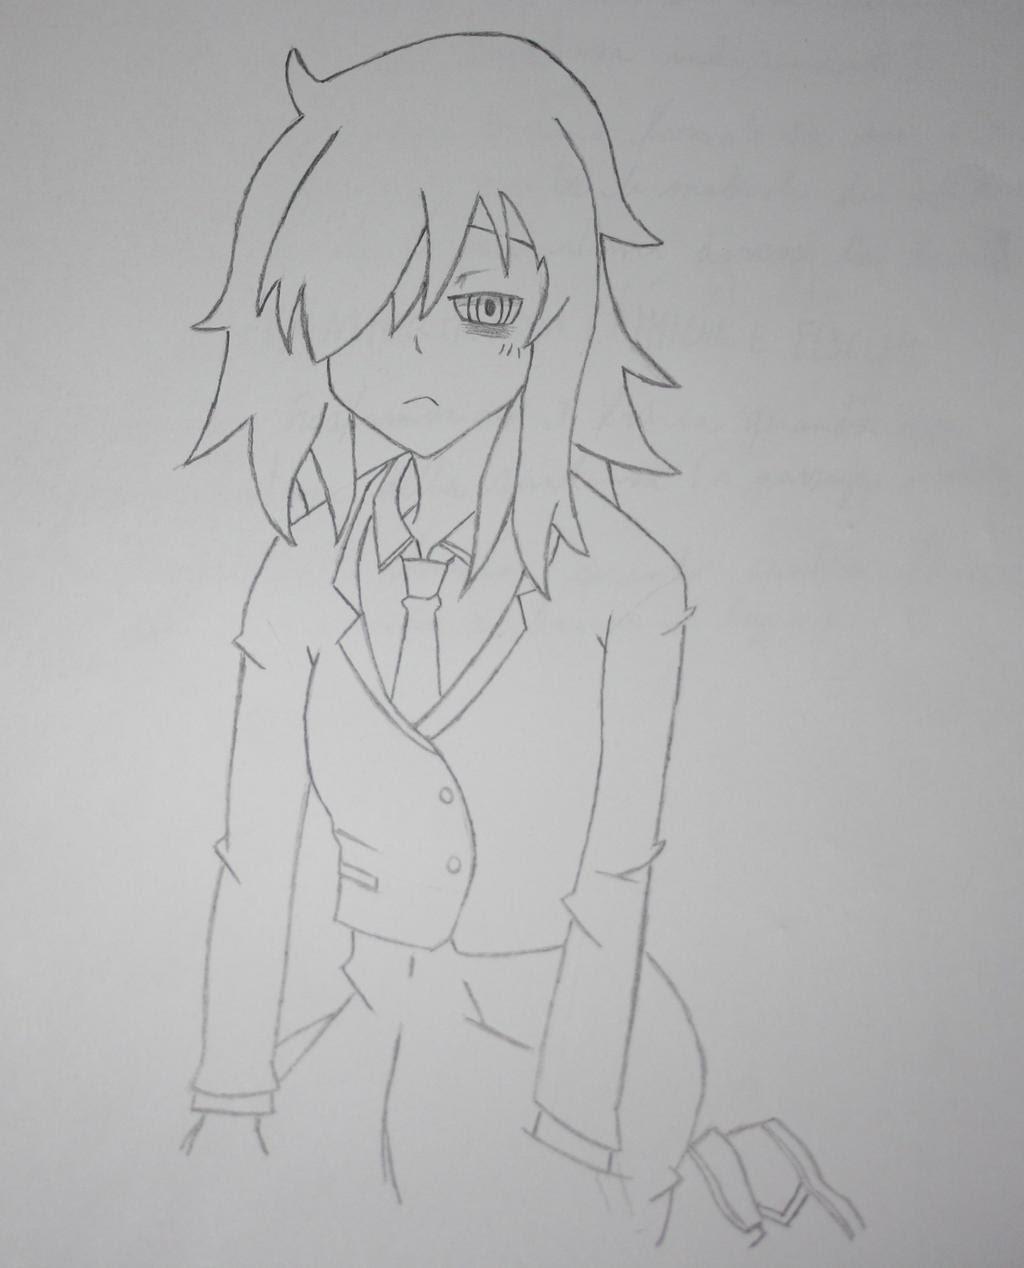 Depressed Anime Girl by MattyPiranha on DeviantArt